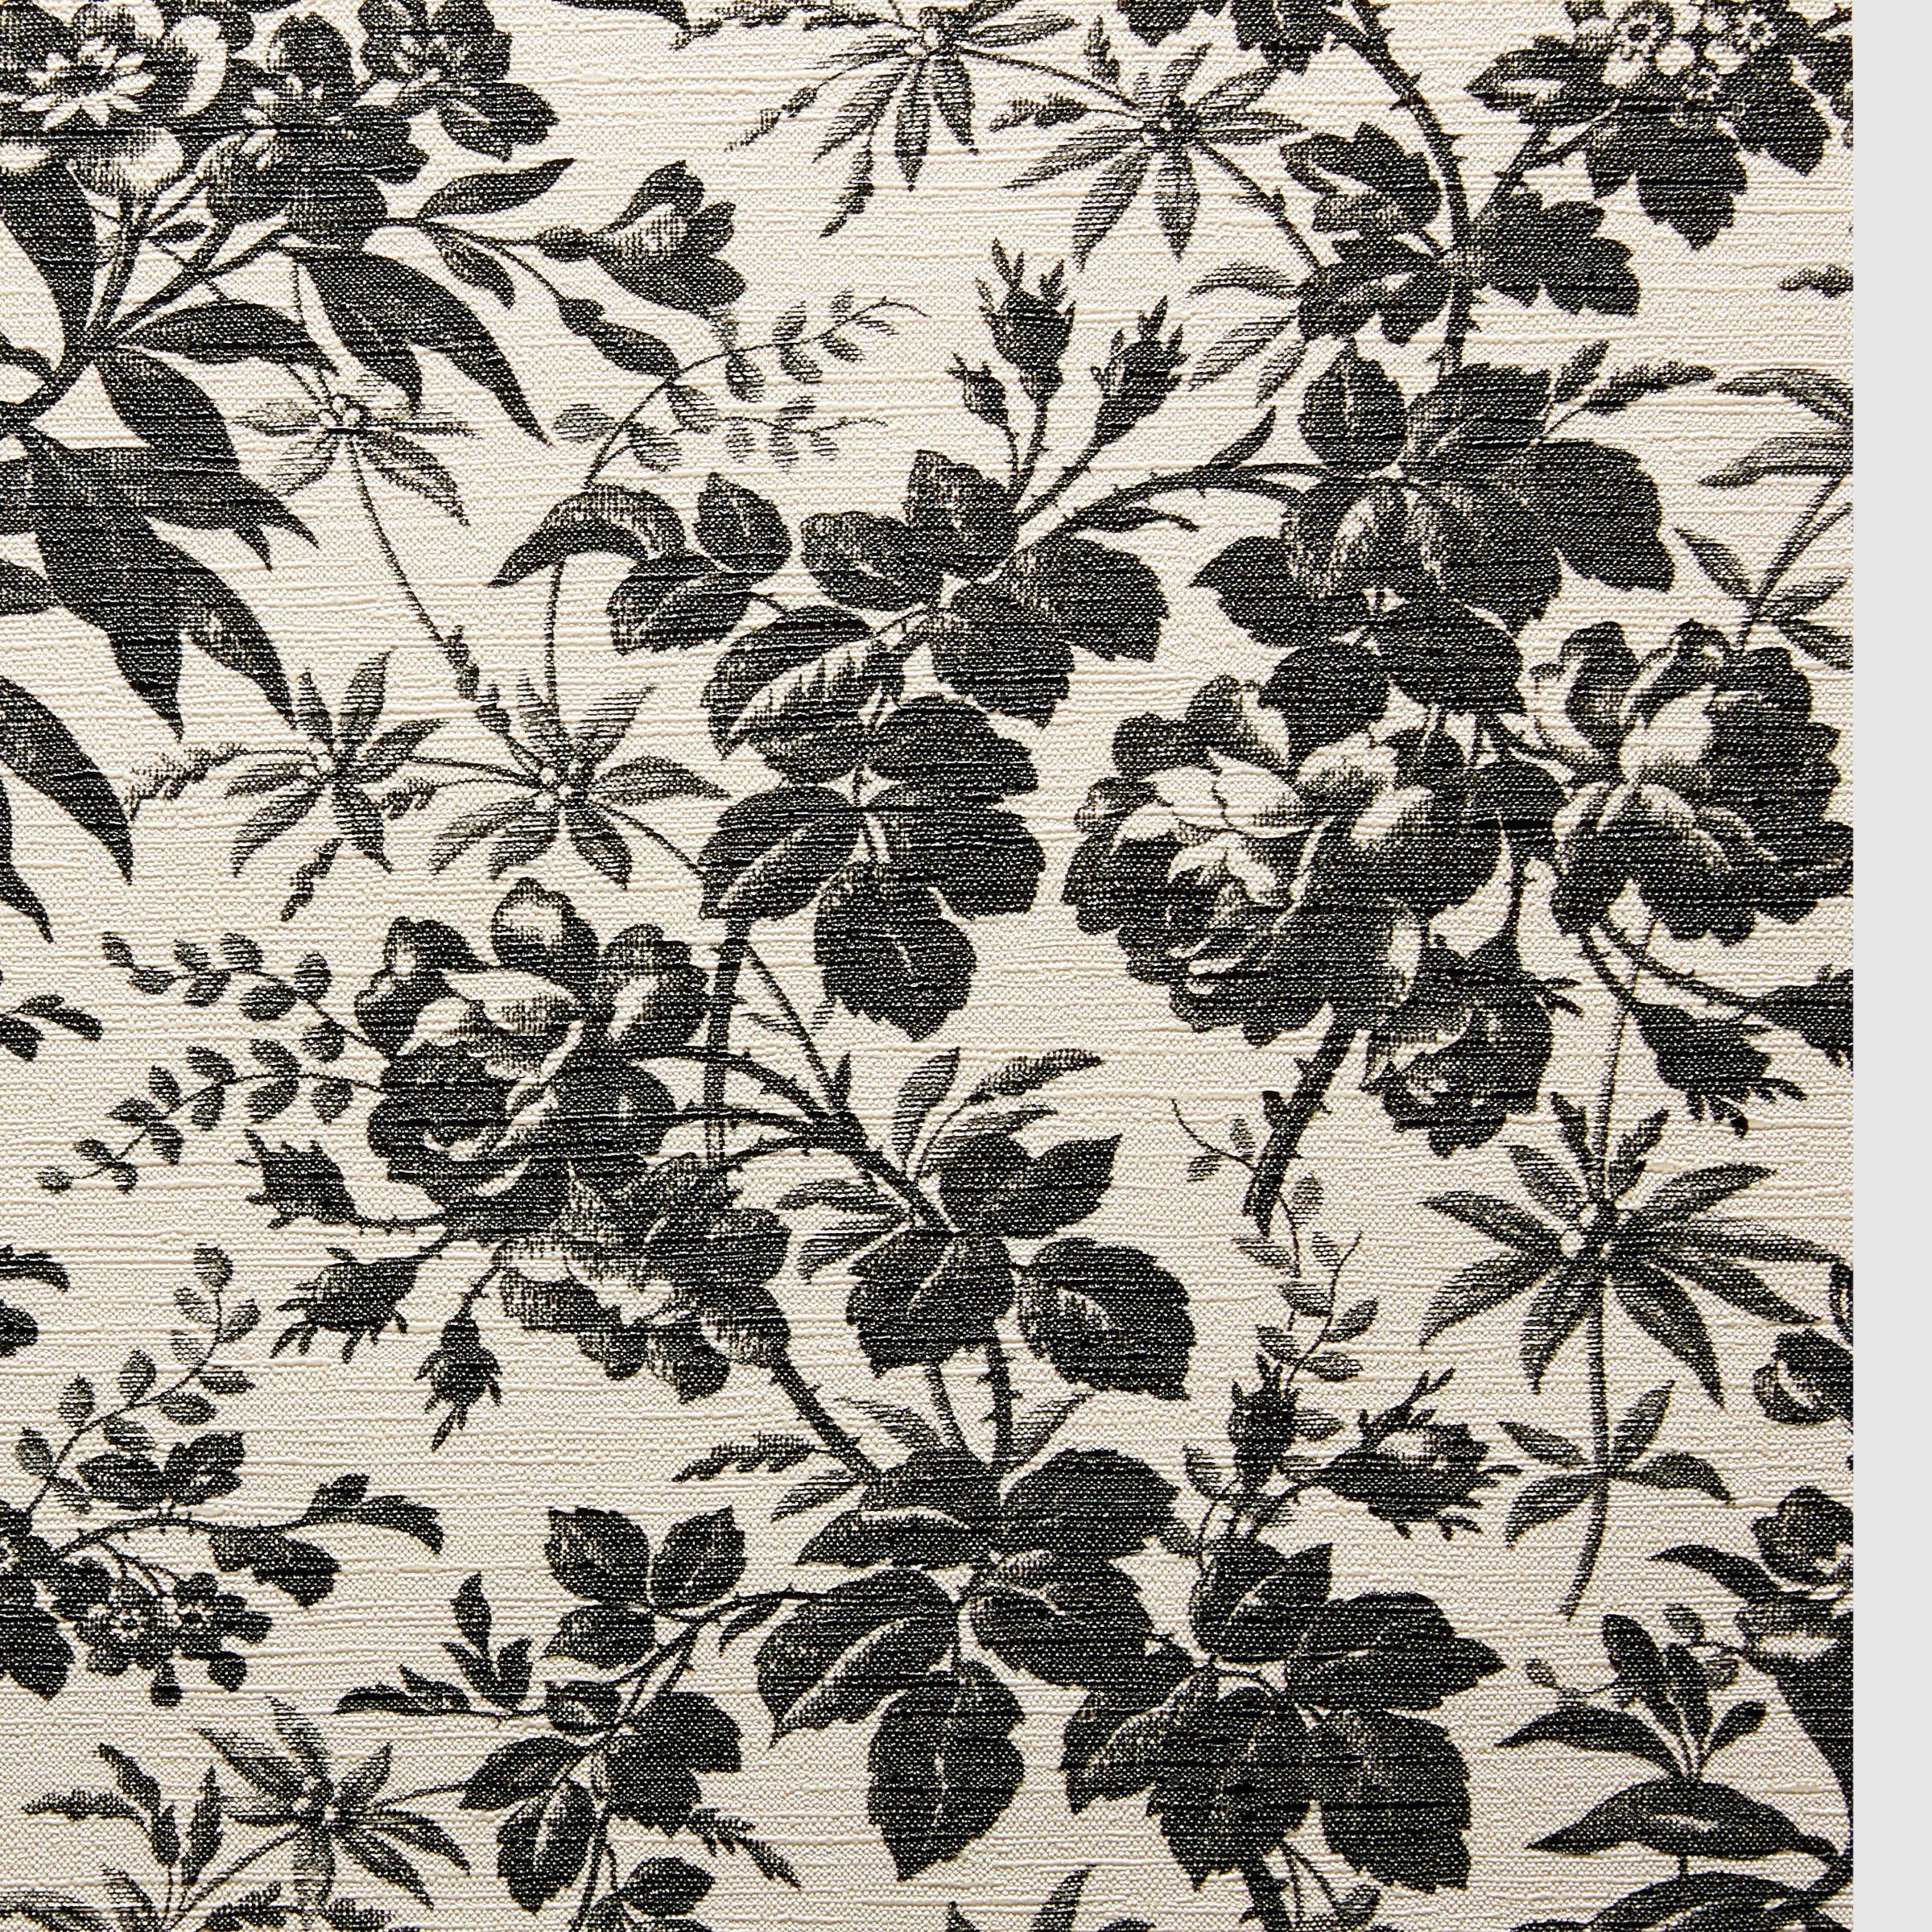 Gucci Herbarium print wallpaper Print wallpaper